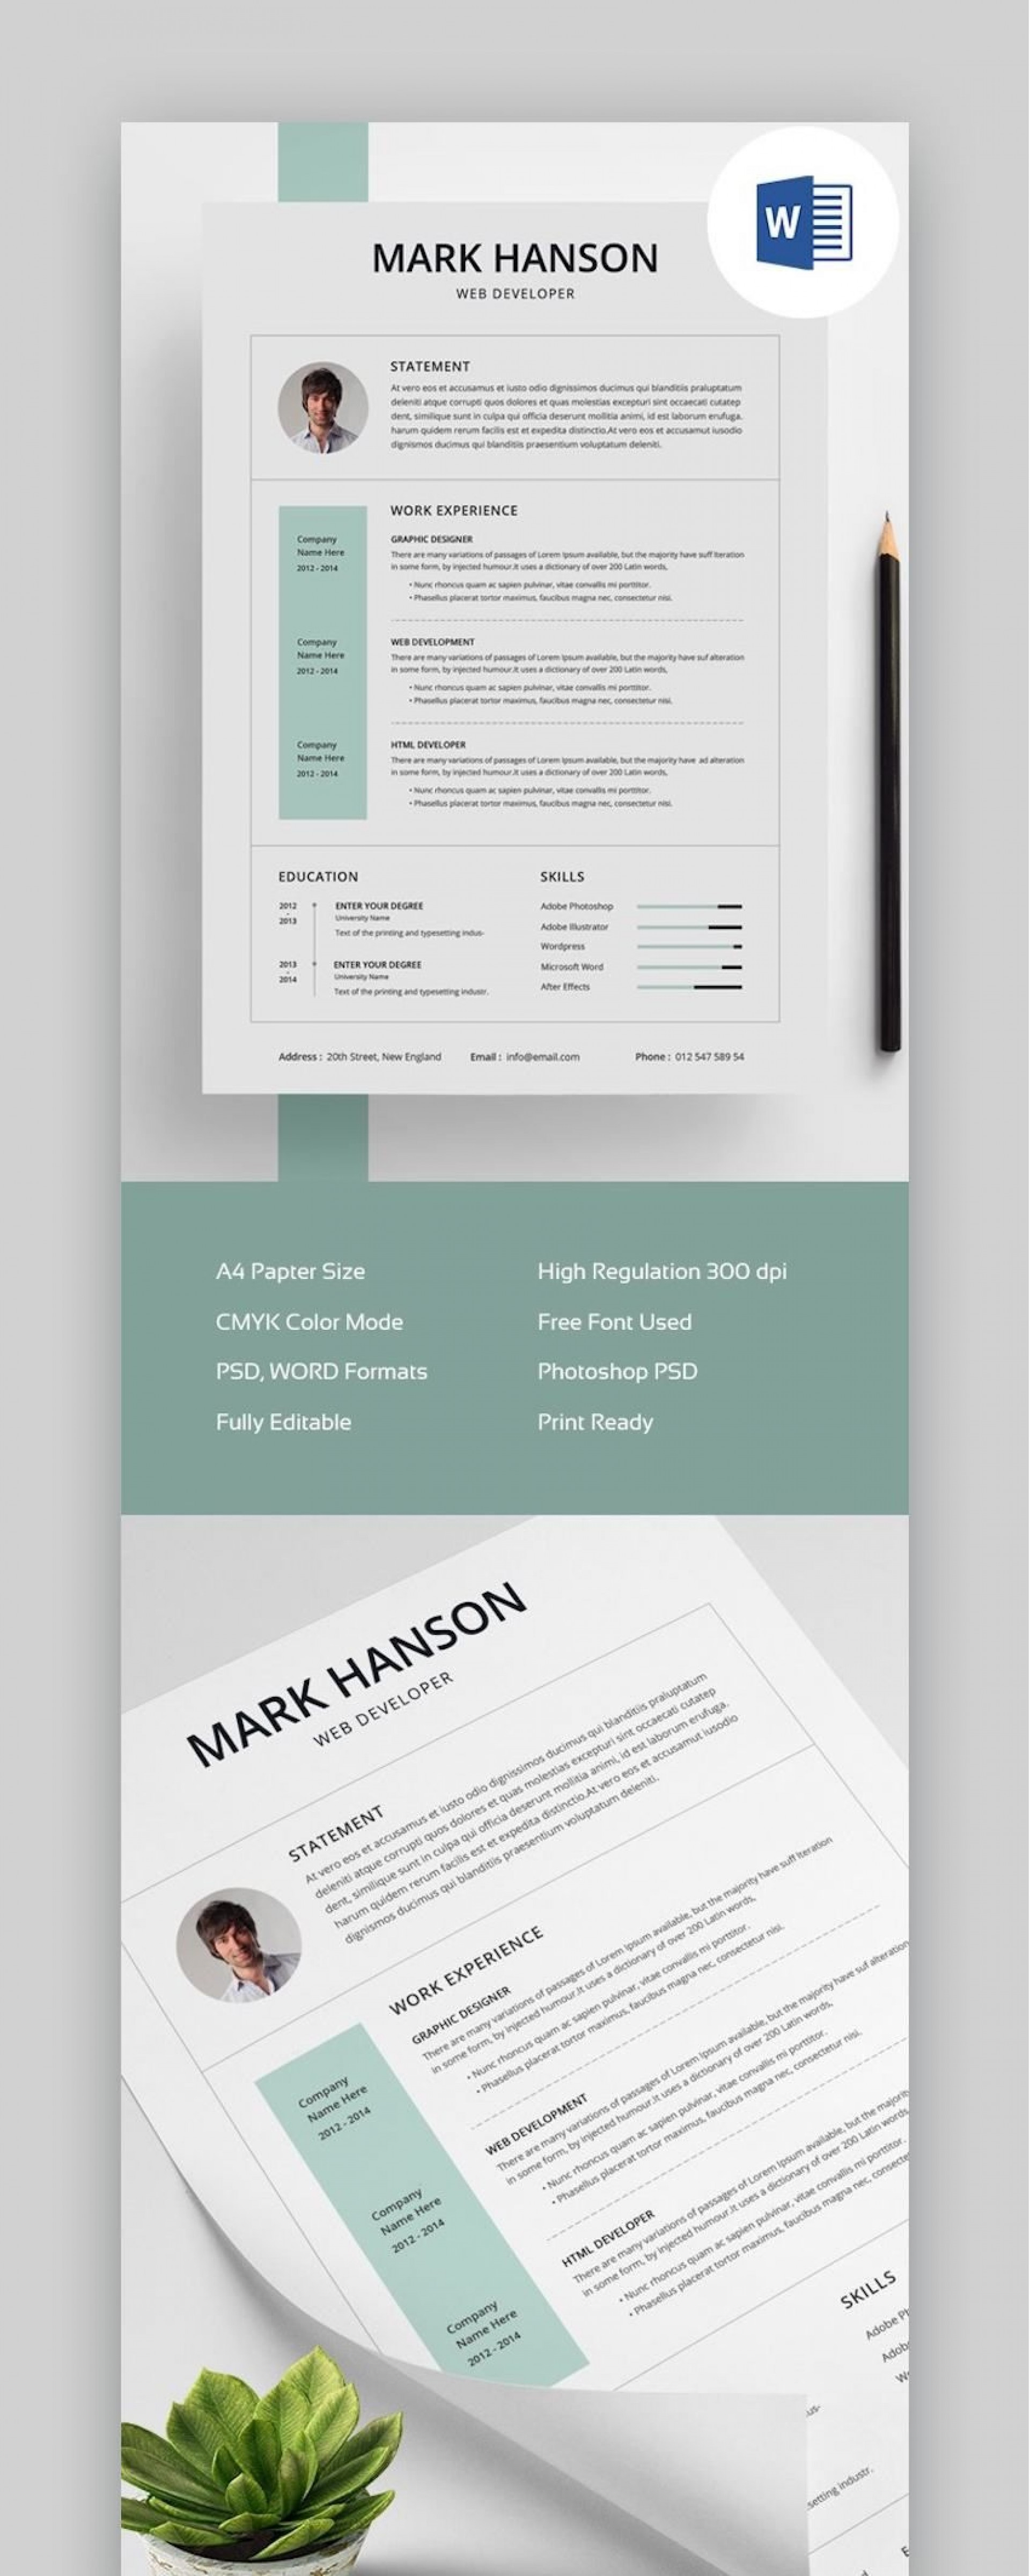 006 Marvelou Creative Resume Template Free Download Psd Image  Cv1920